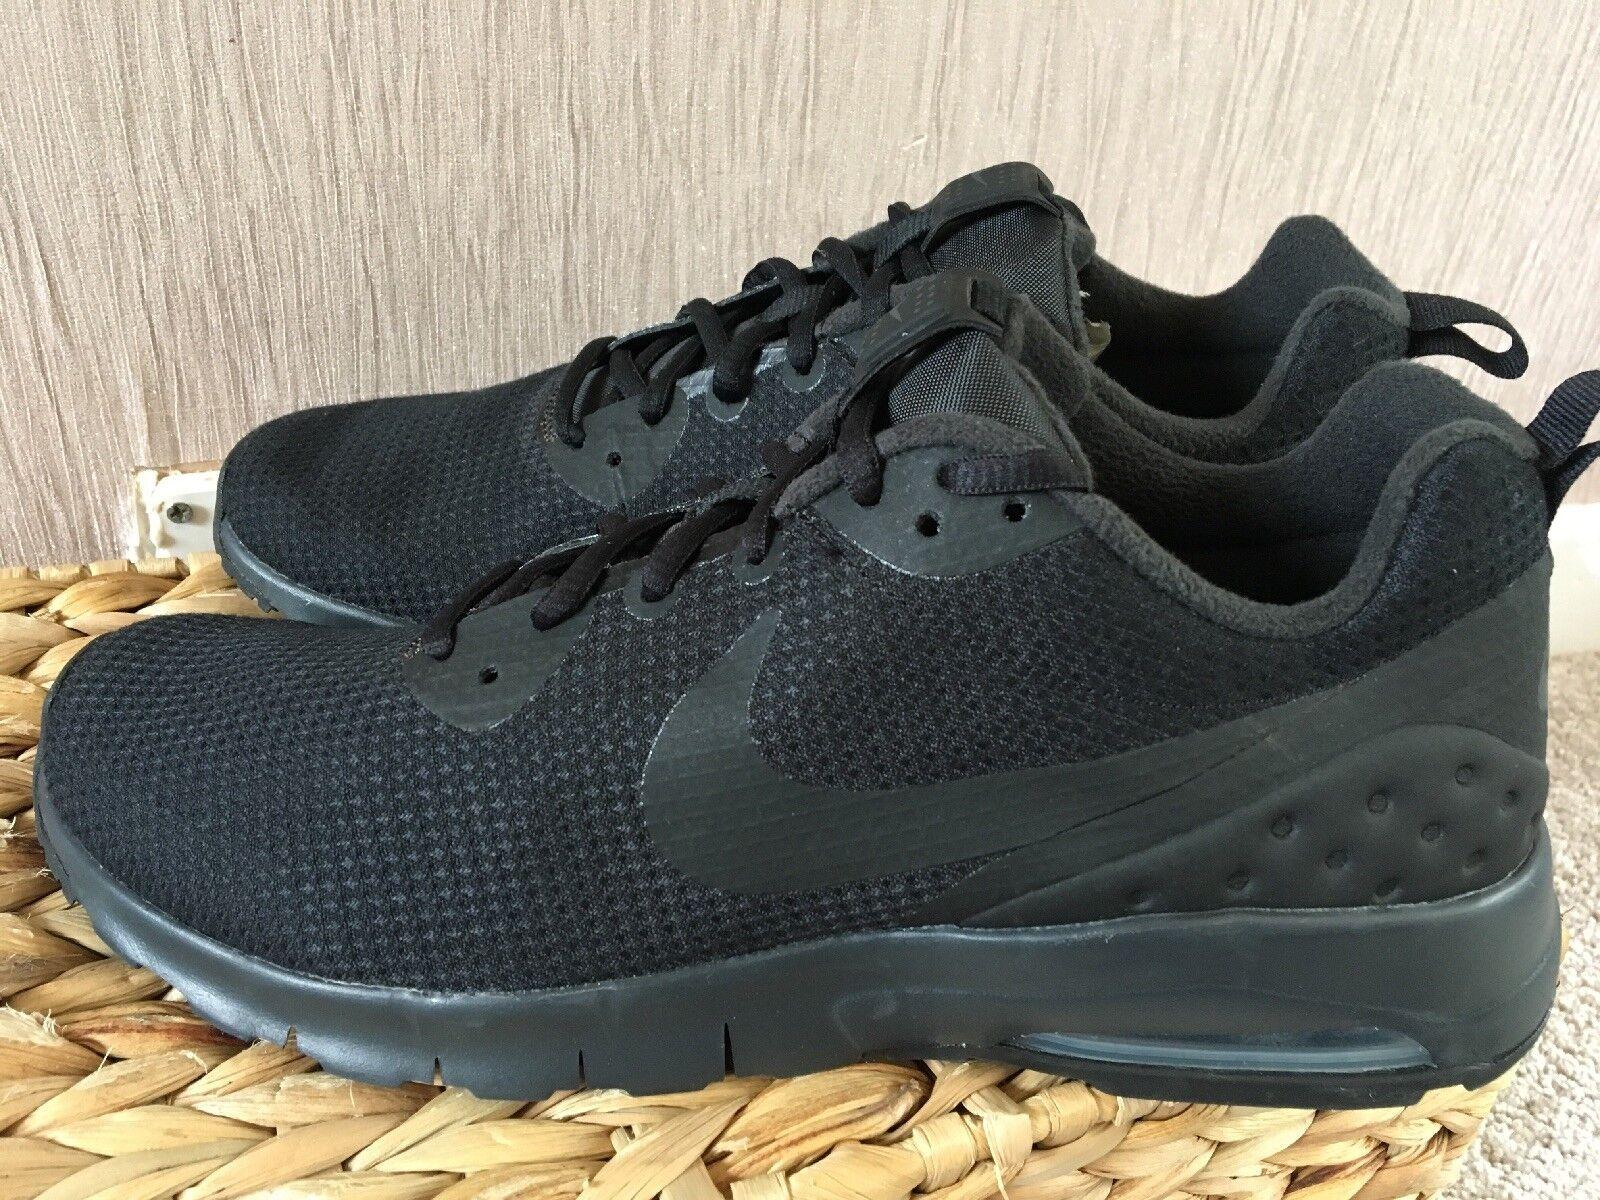 Nike Air Max Motion Mens Trainers Uk 7 Brand New B86